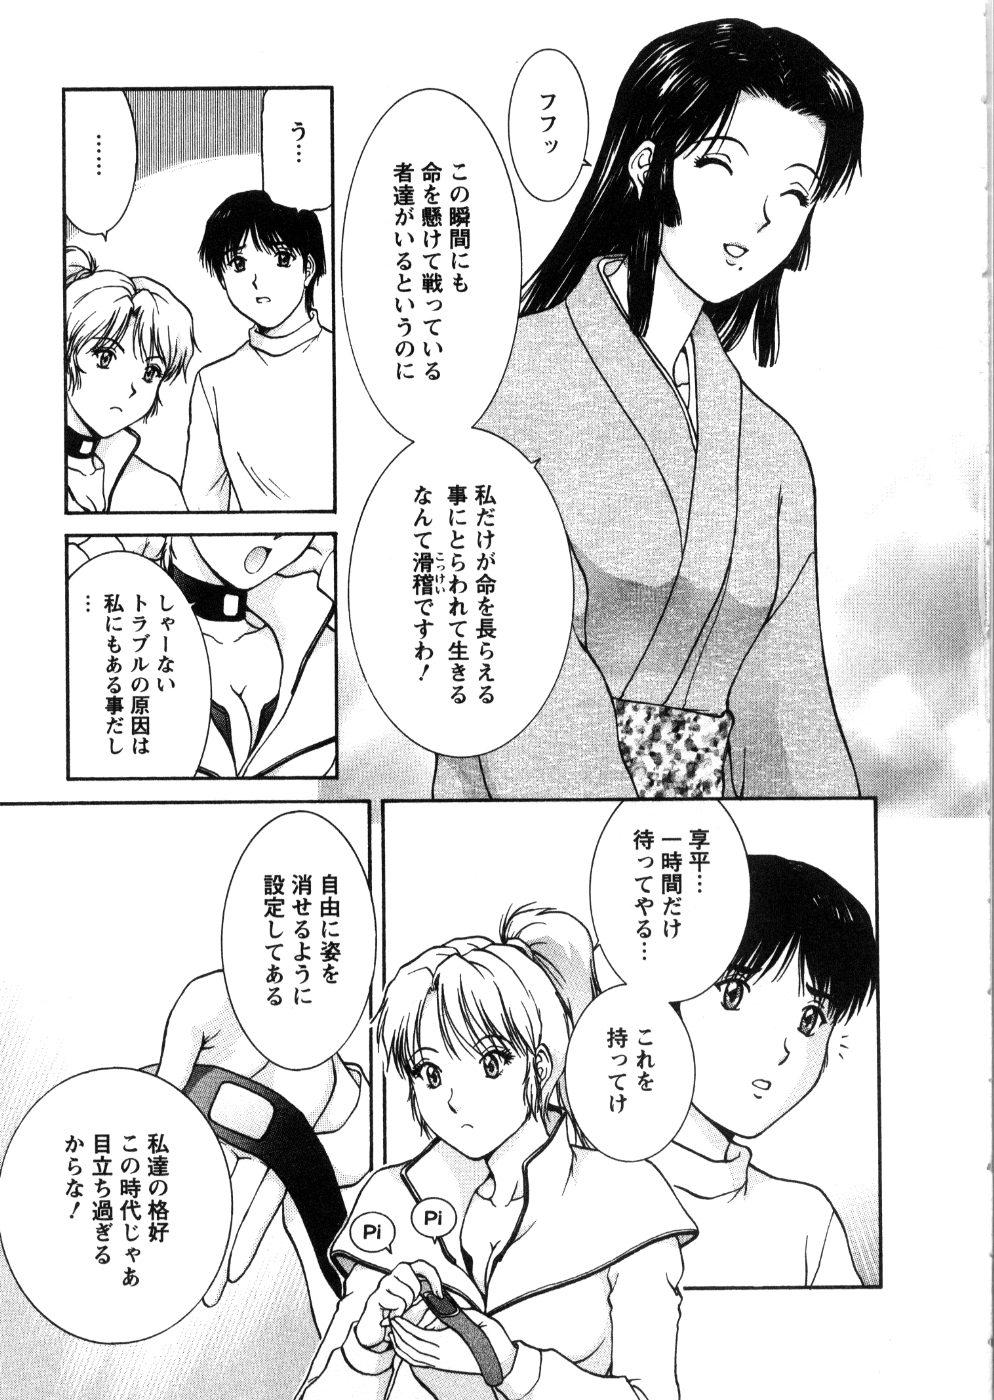 Oneechan-tachi ga Yatte Kuru 03 32